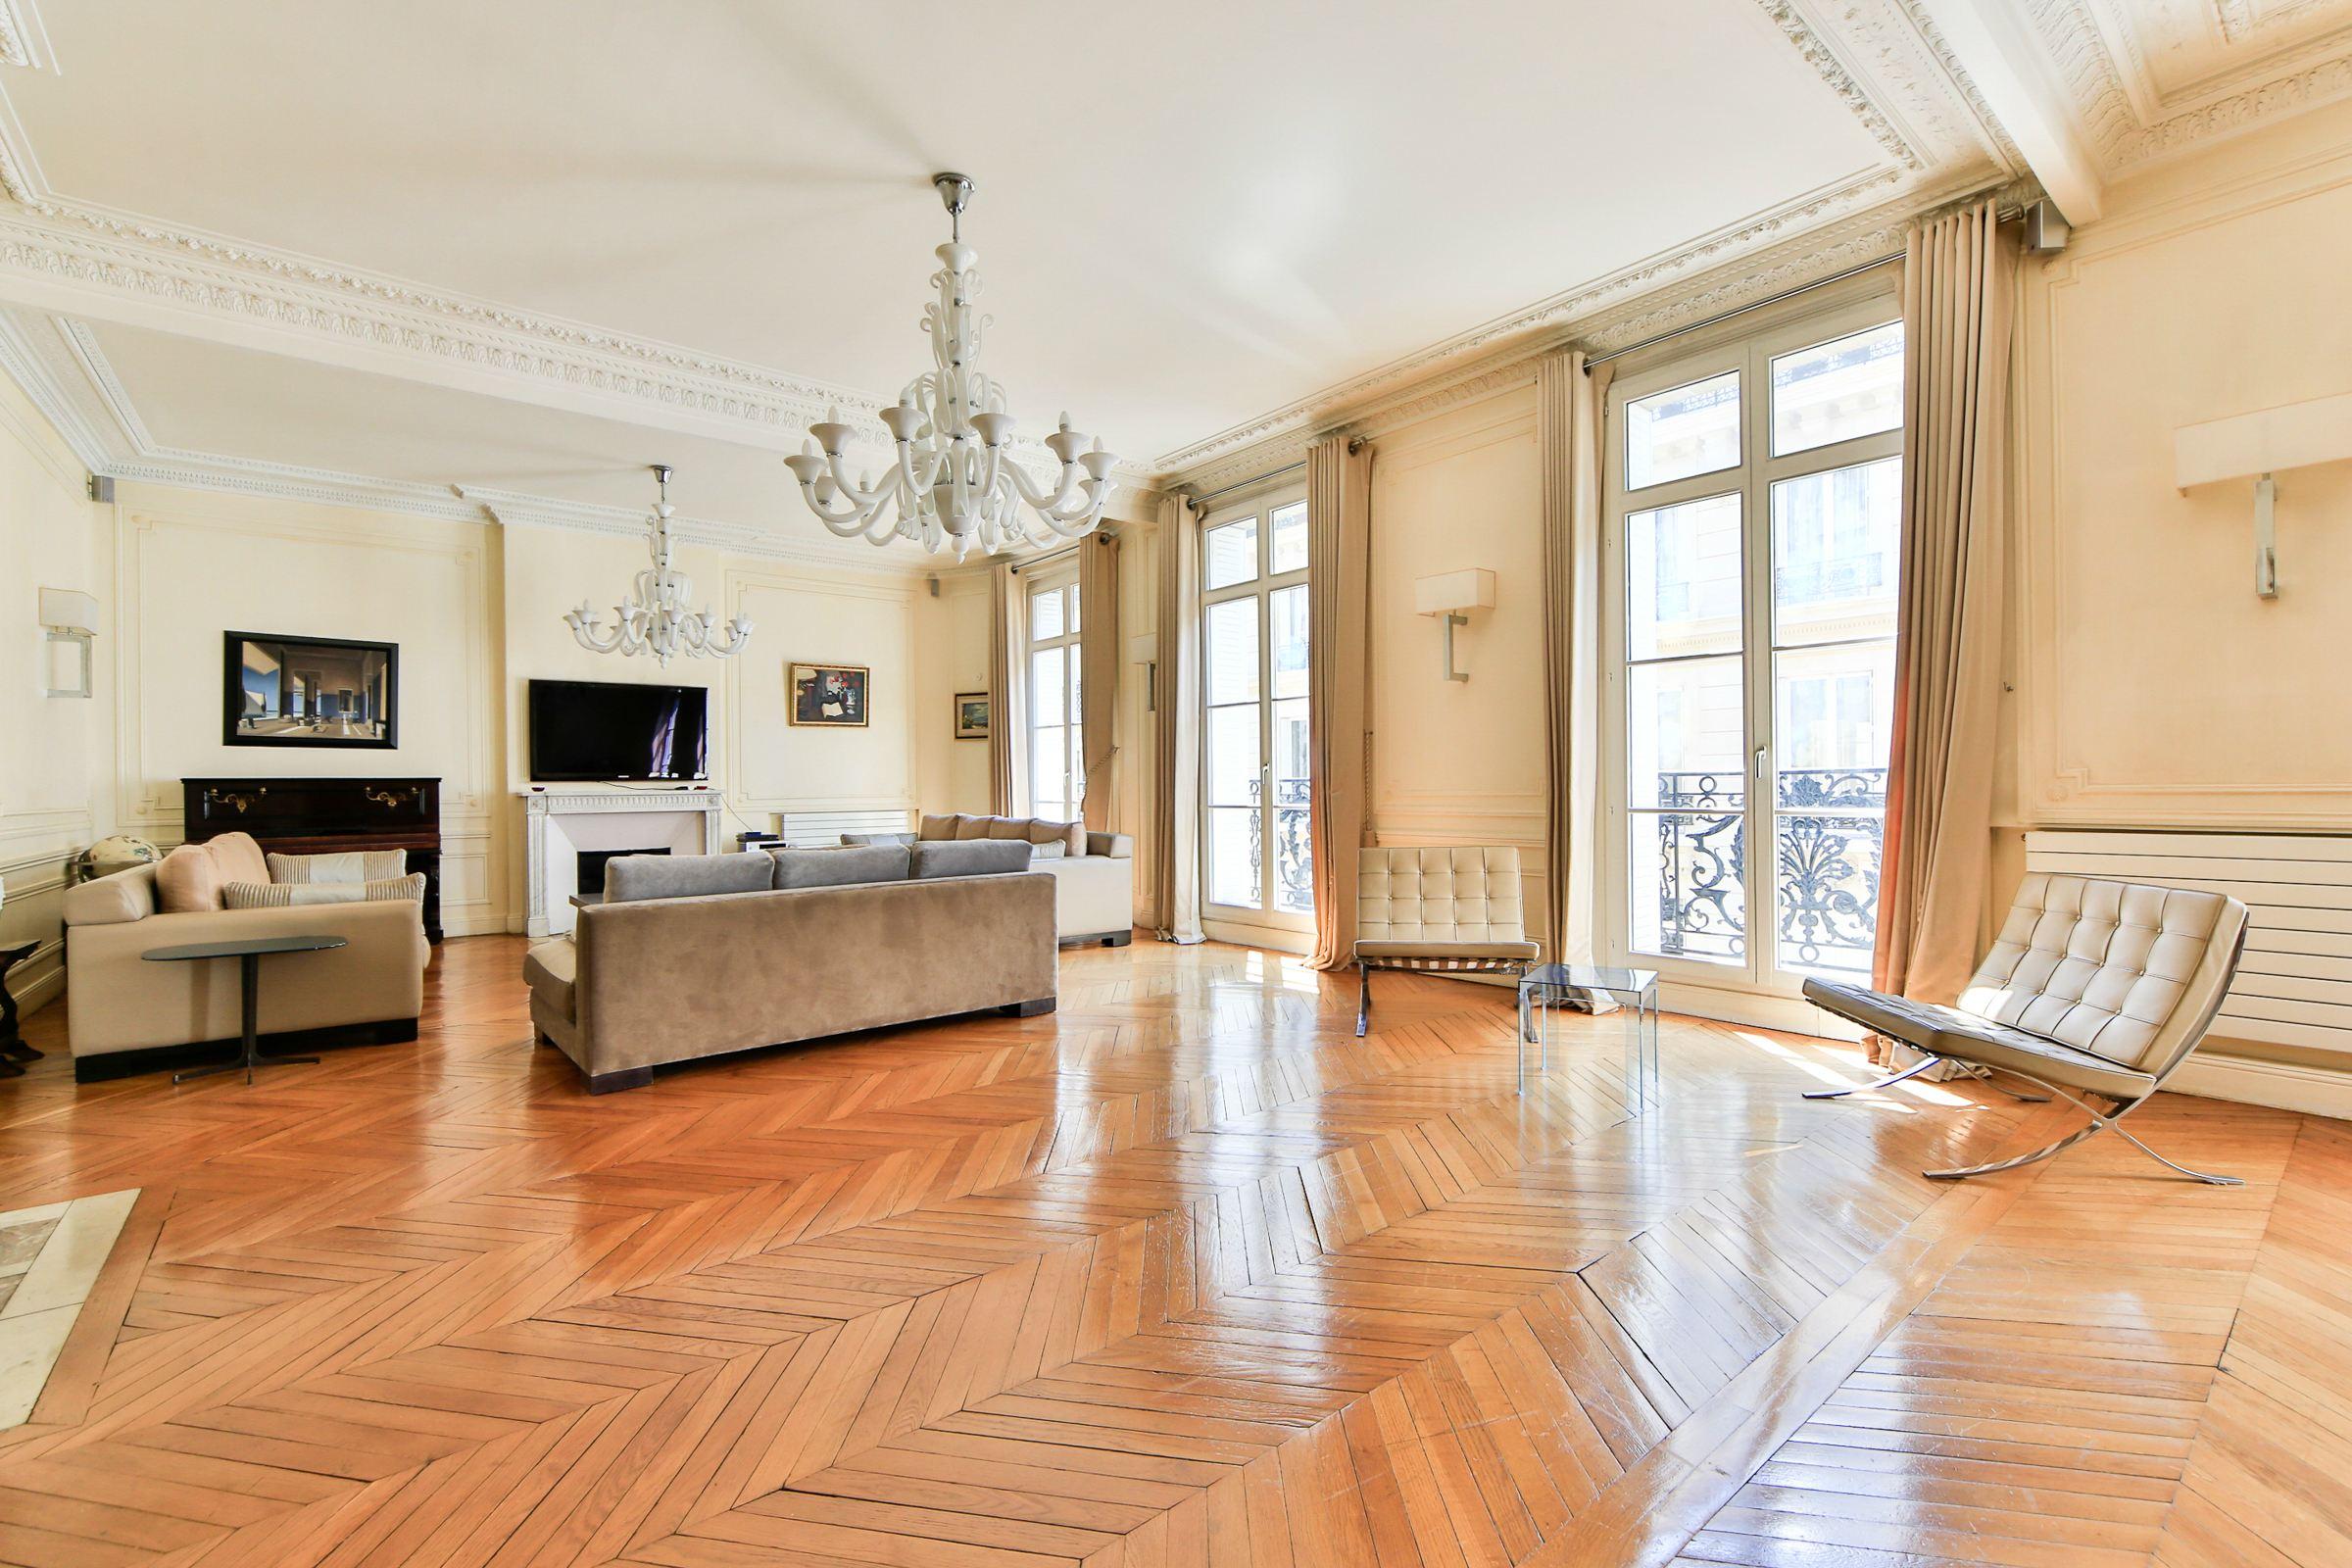 sales property at On sale high end apartment Paris 16 - OCDE